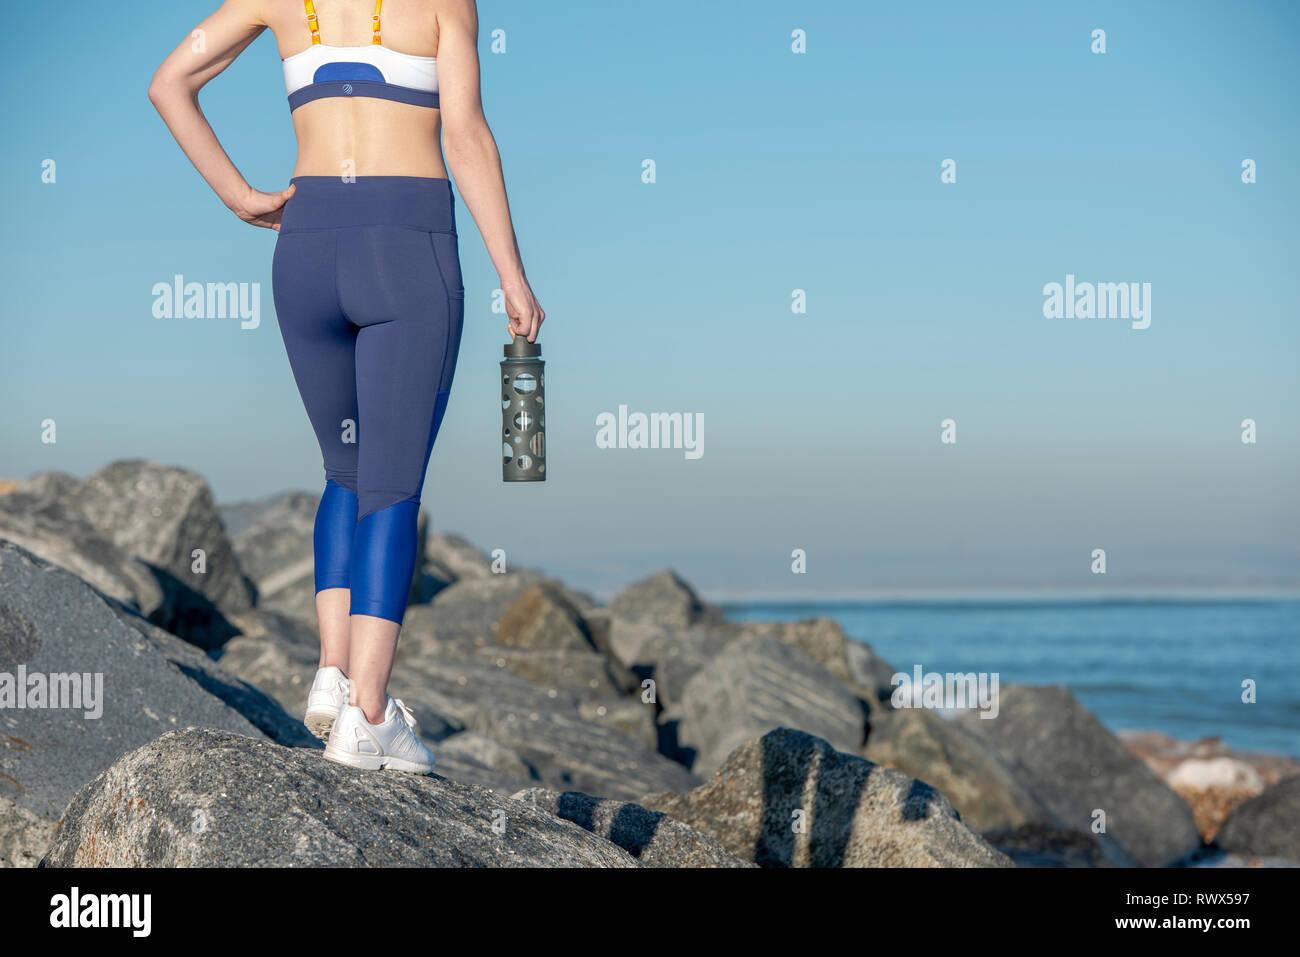 close up of a sports water bottle, womans legs in sportswear leggings - Stock Image